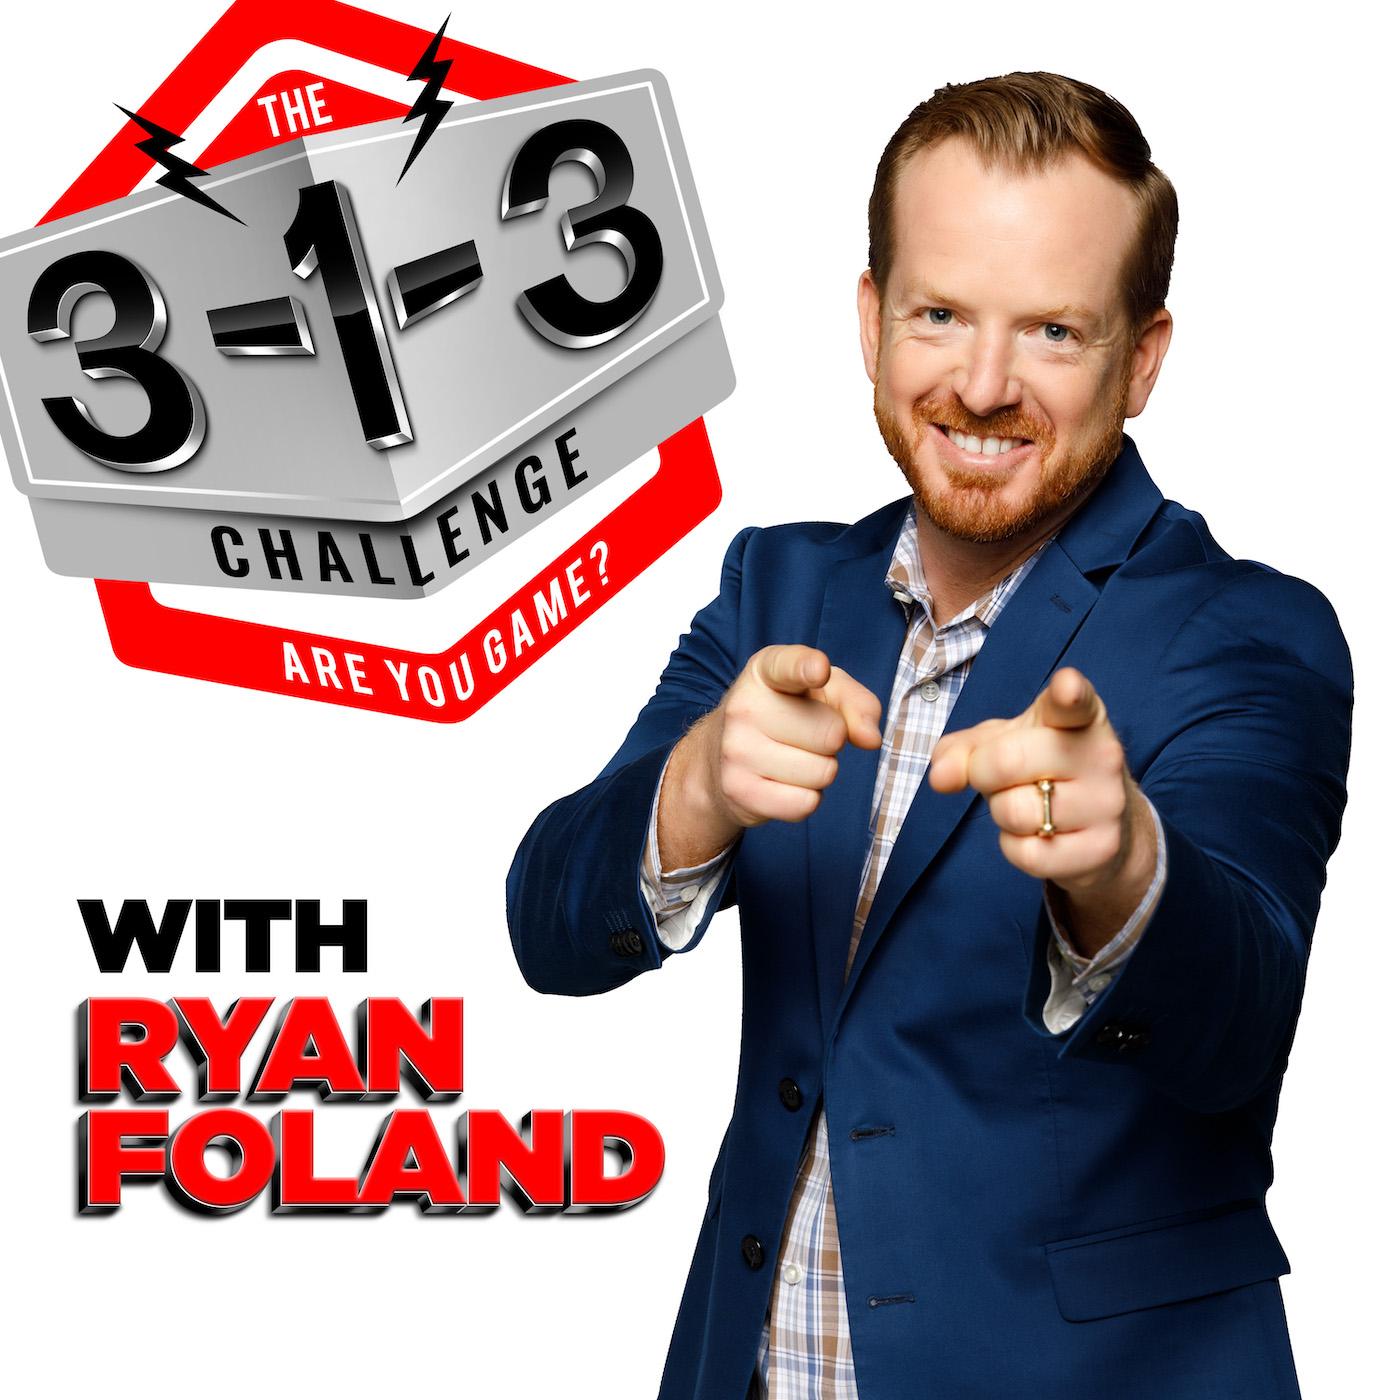 Ryan Foland